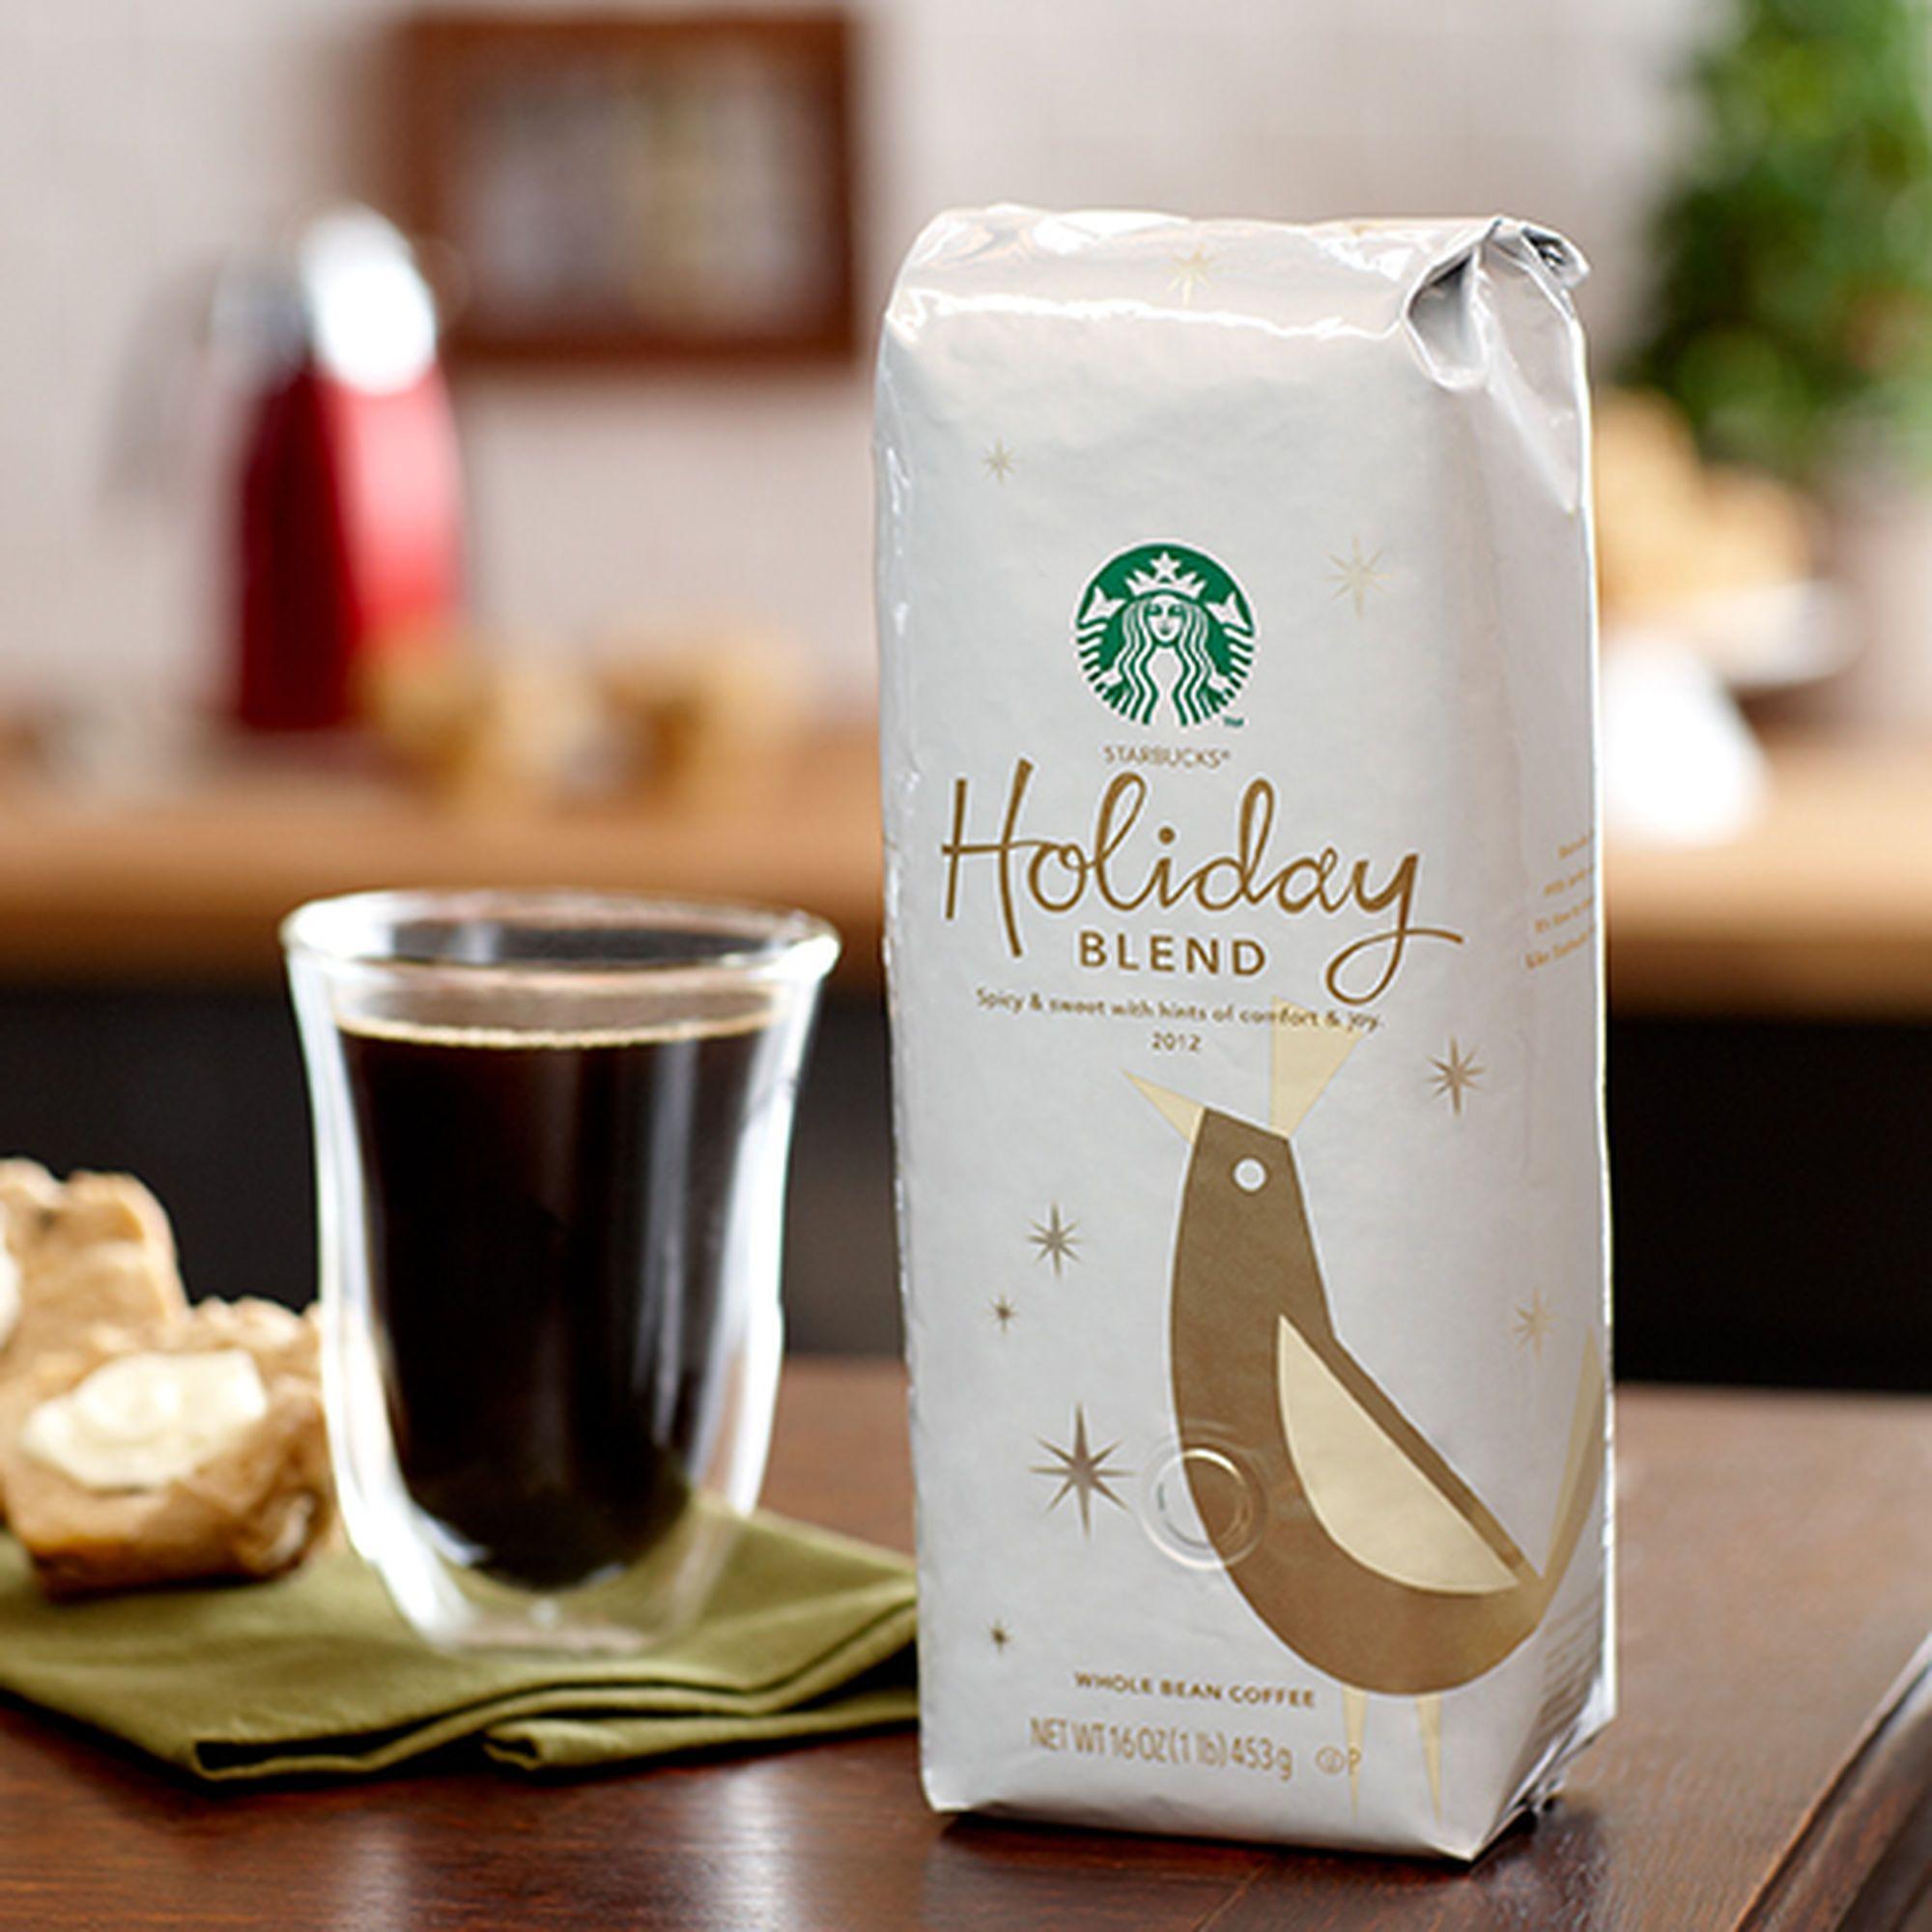 Starbucks® Holiday Blend Holiday blend, Starbucks